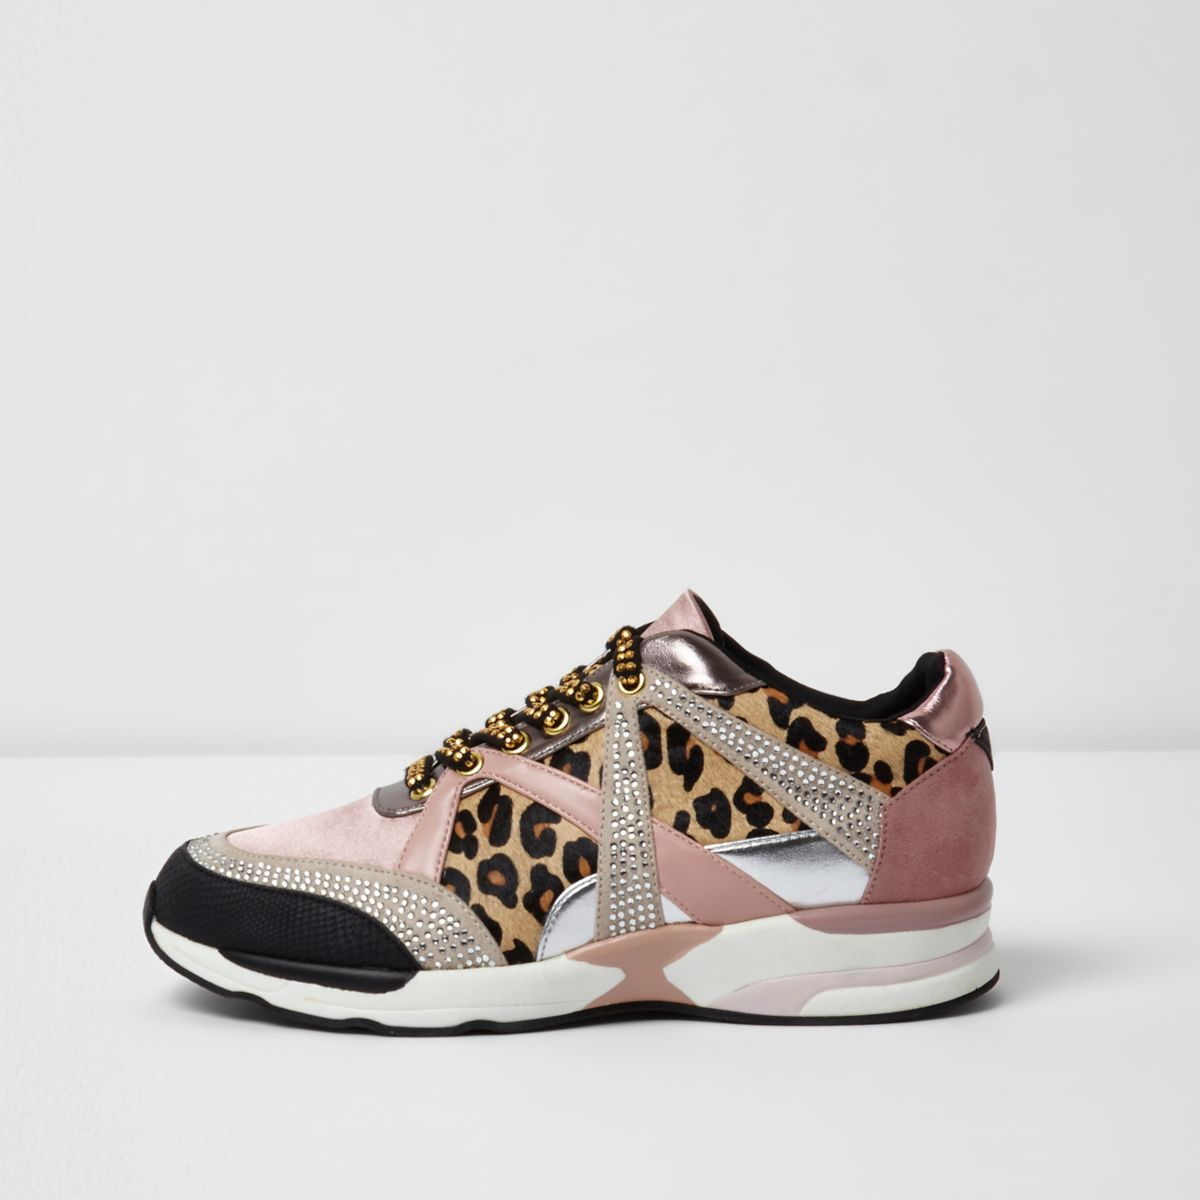 Gold metallic leopard print runner trainers